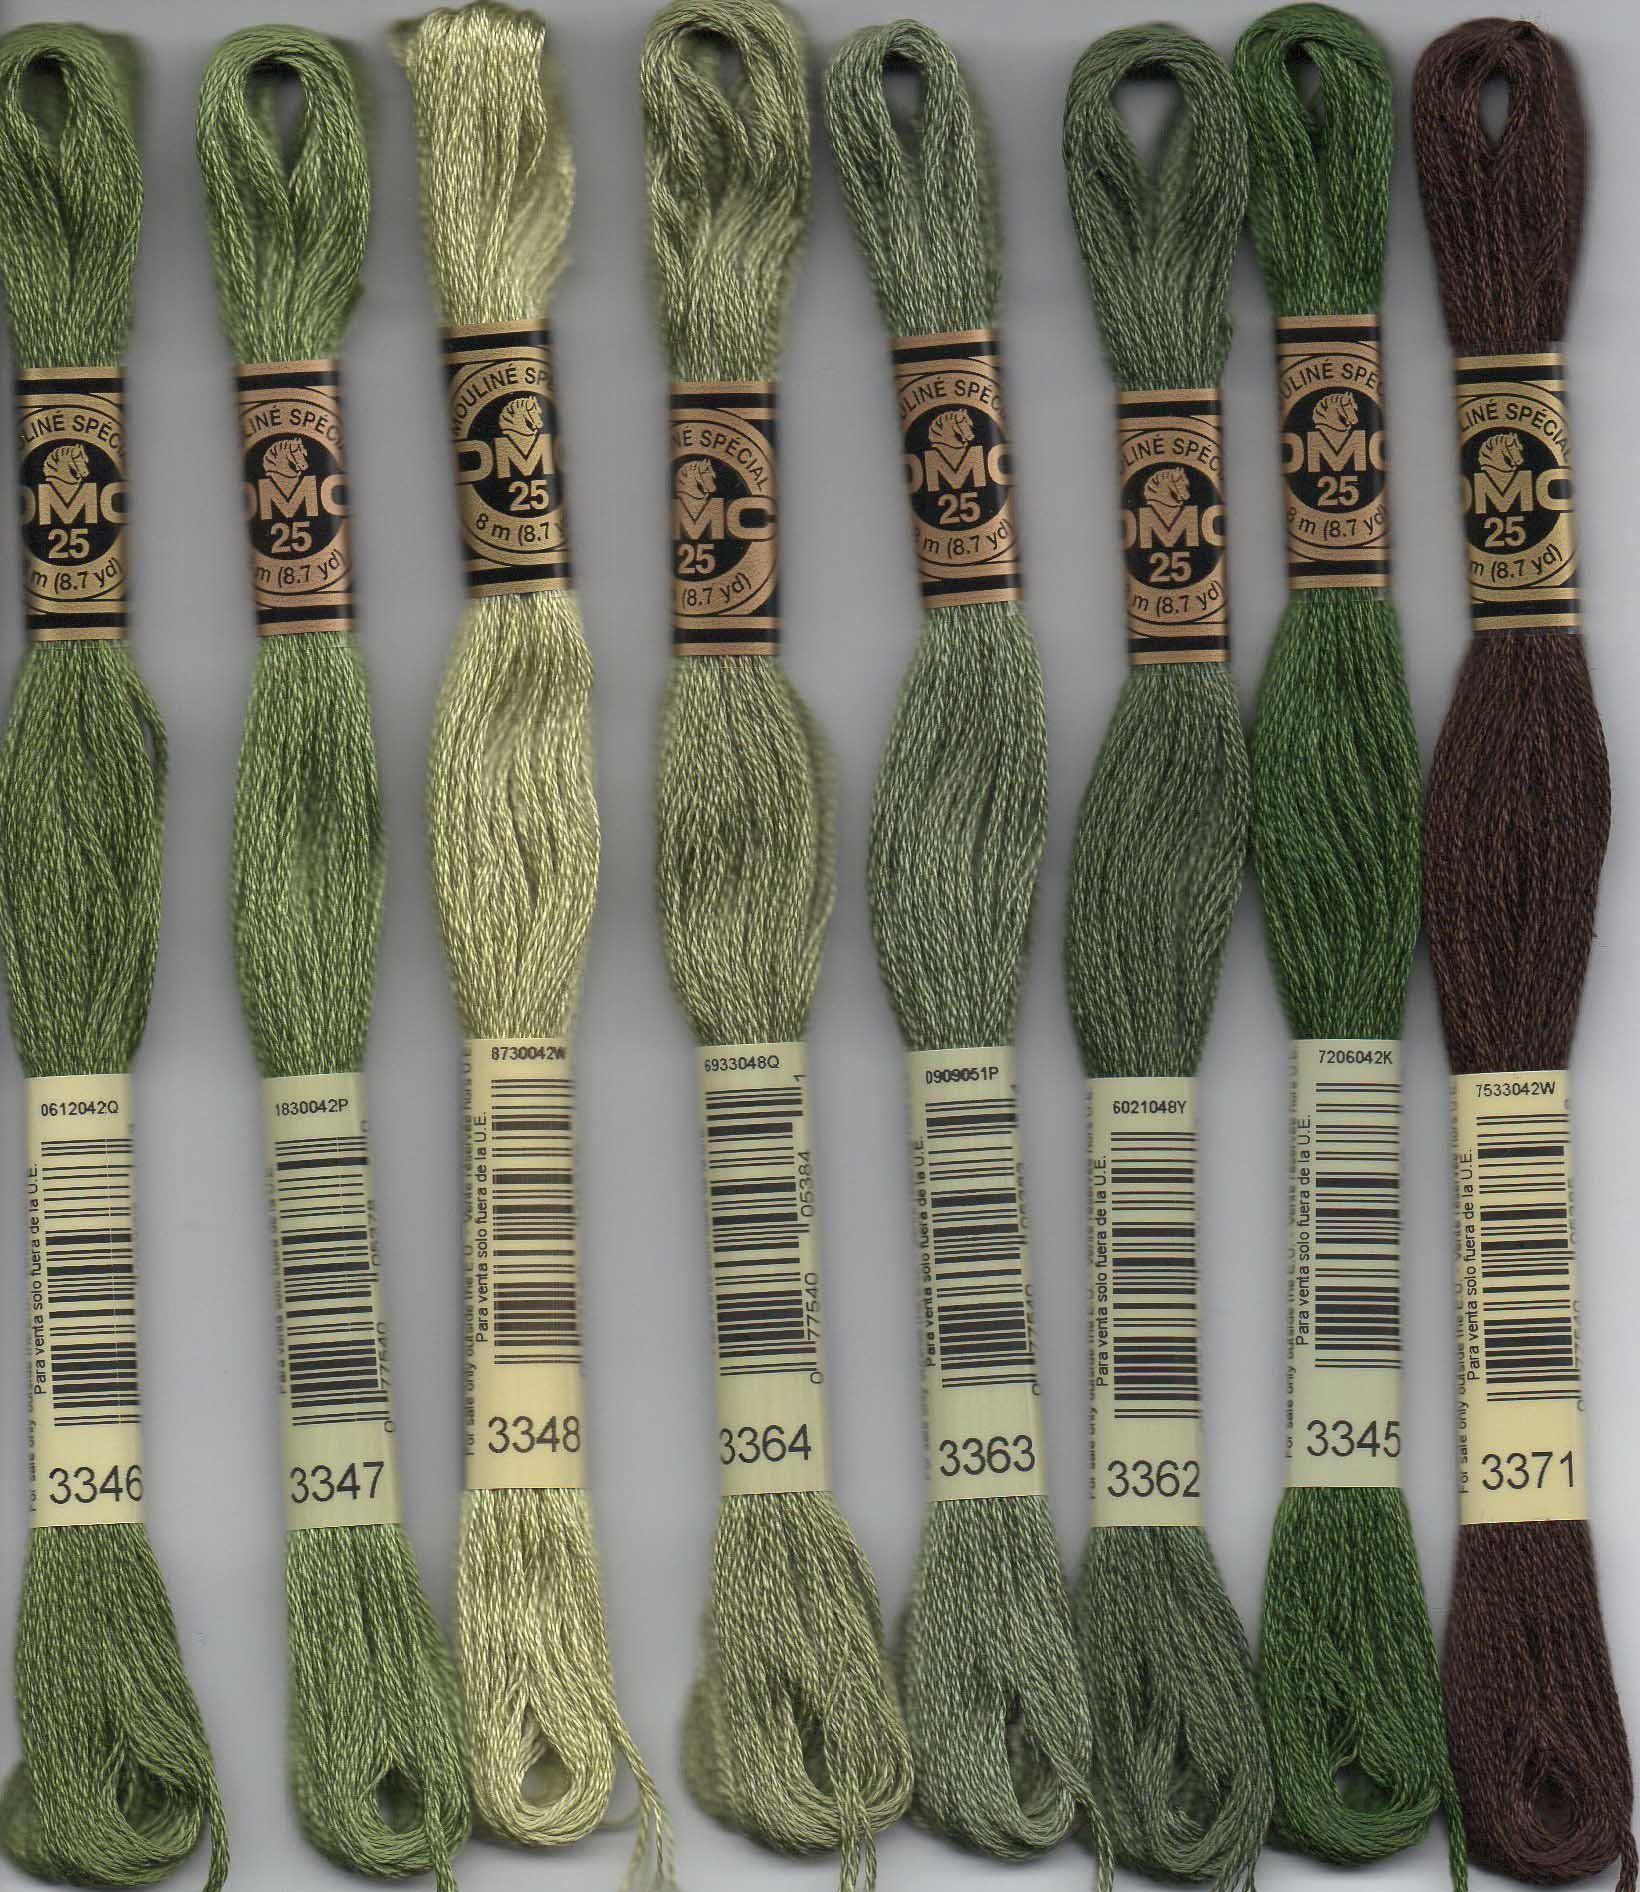 Stranded Cotton 3341 DMC Embroidery Thread